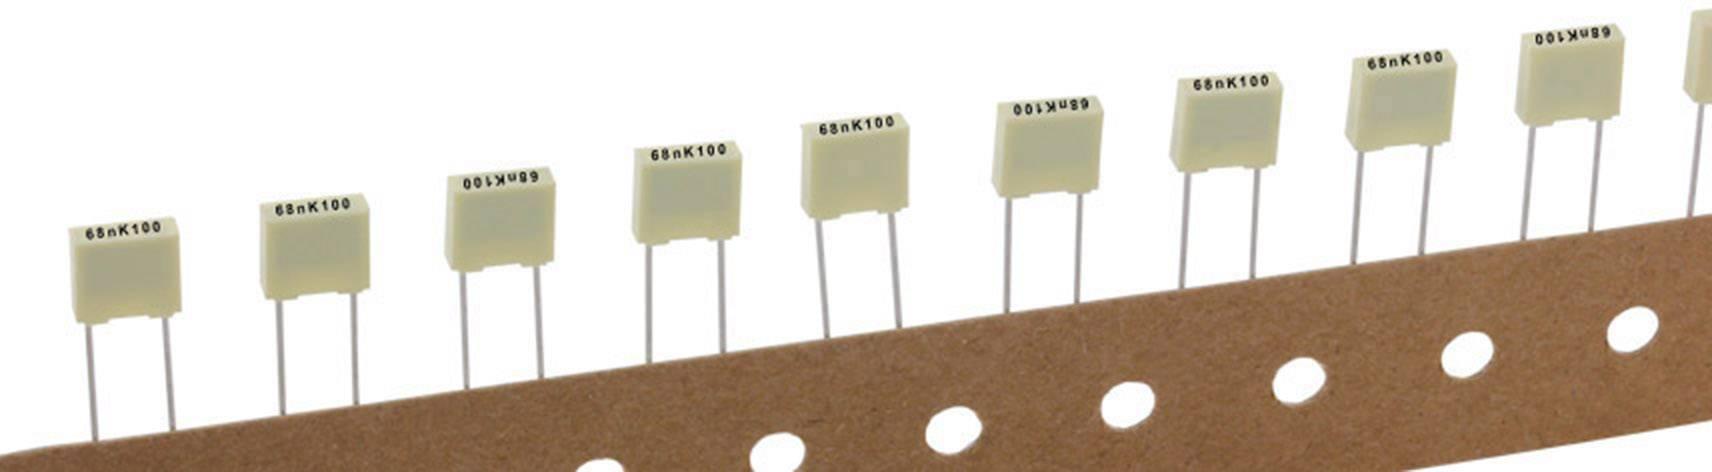 Polyesterový kondenzátor Kemet R82EC2680DQ60K+ radiální, 68 nF, 100 V,10 %, 5 mm, (d x š x v) 7.2 x 2.5 mm x 6.5 mm, 1 ks